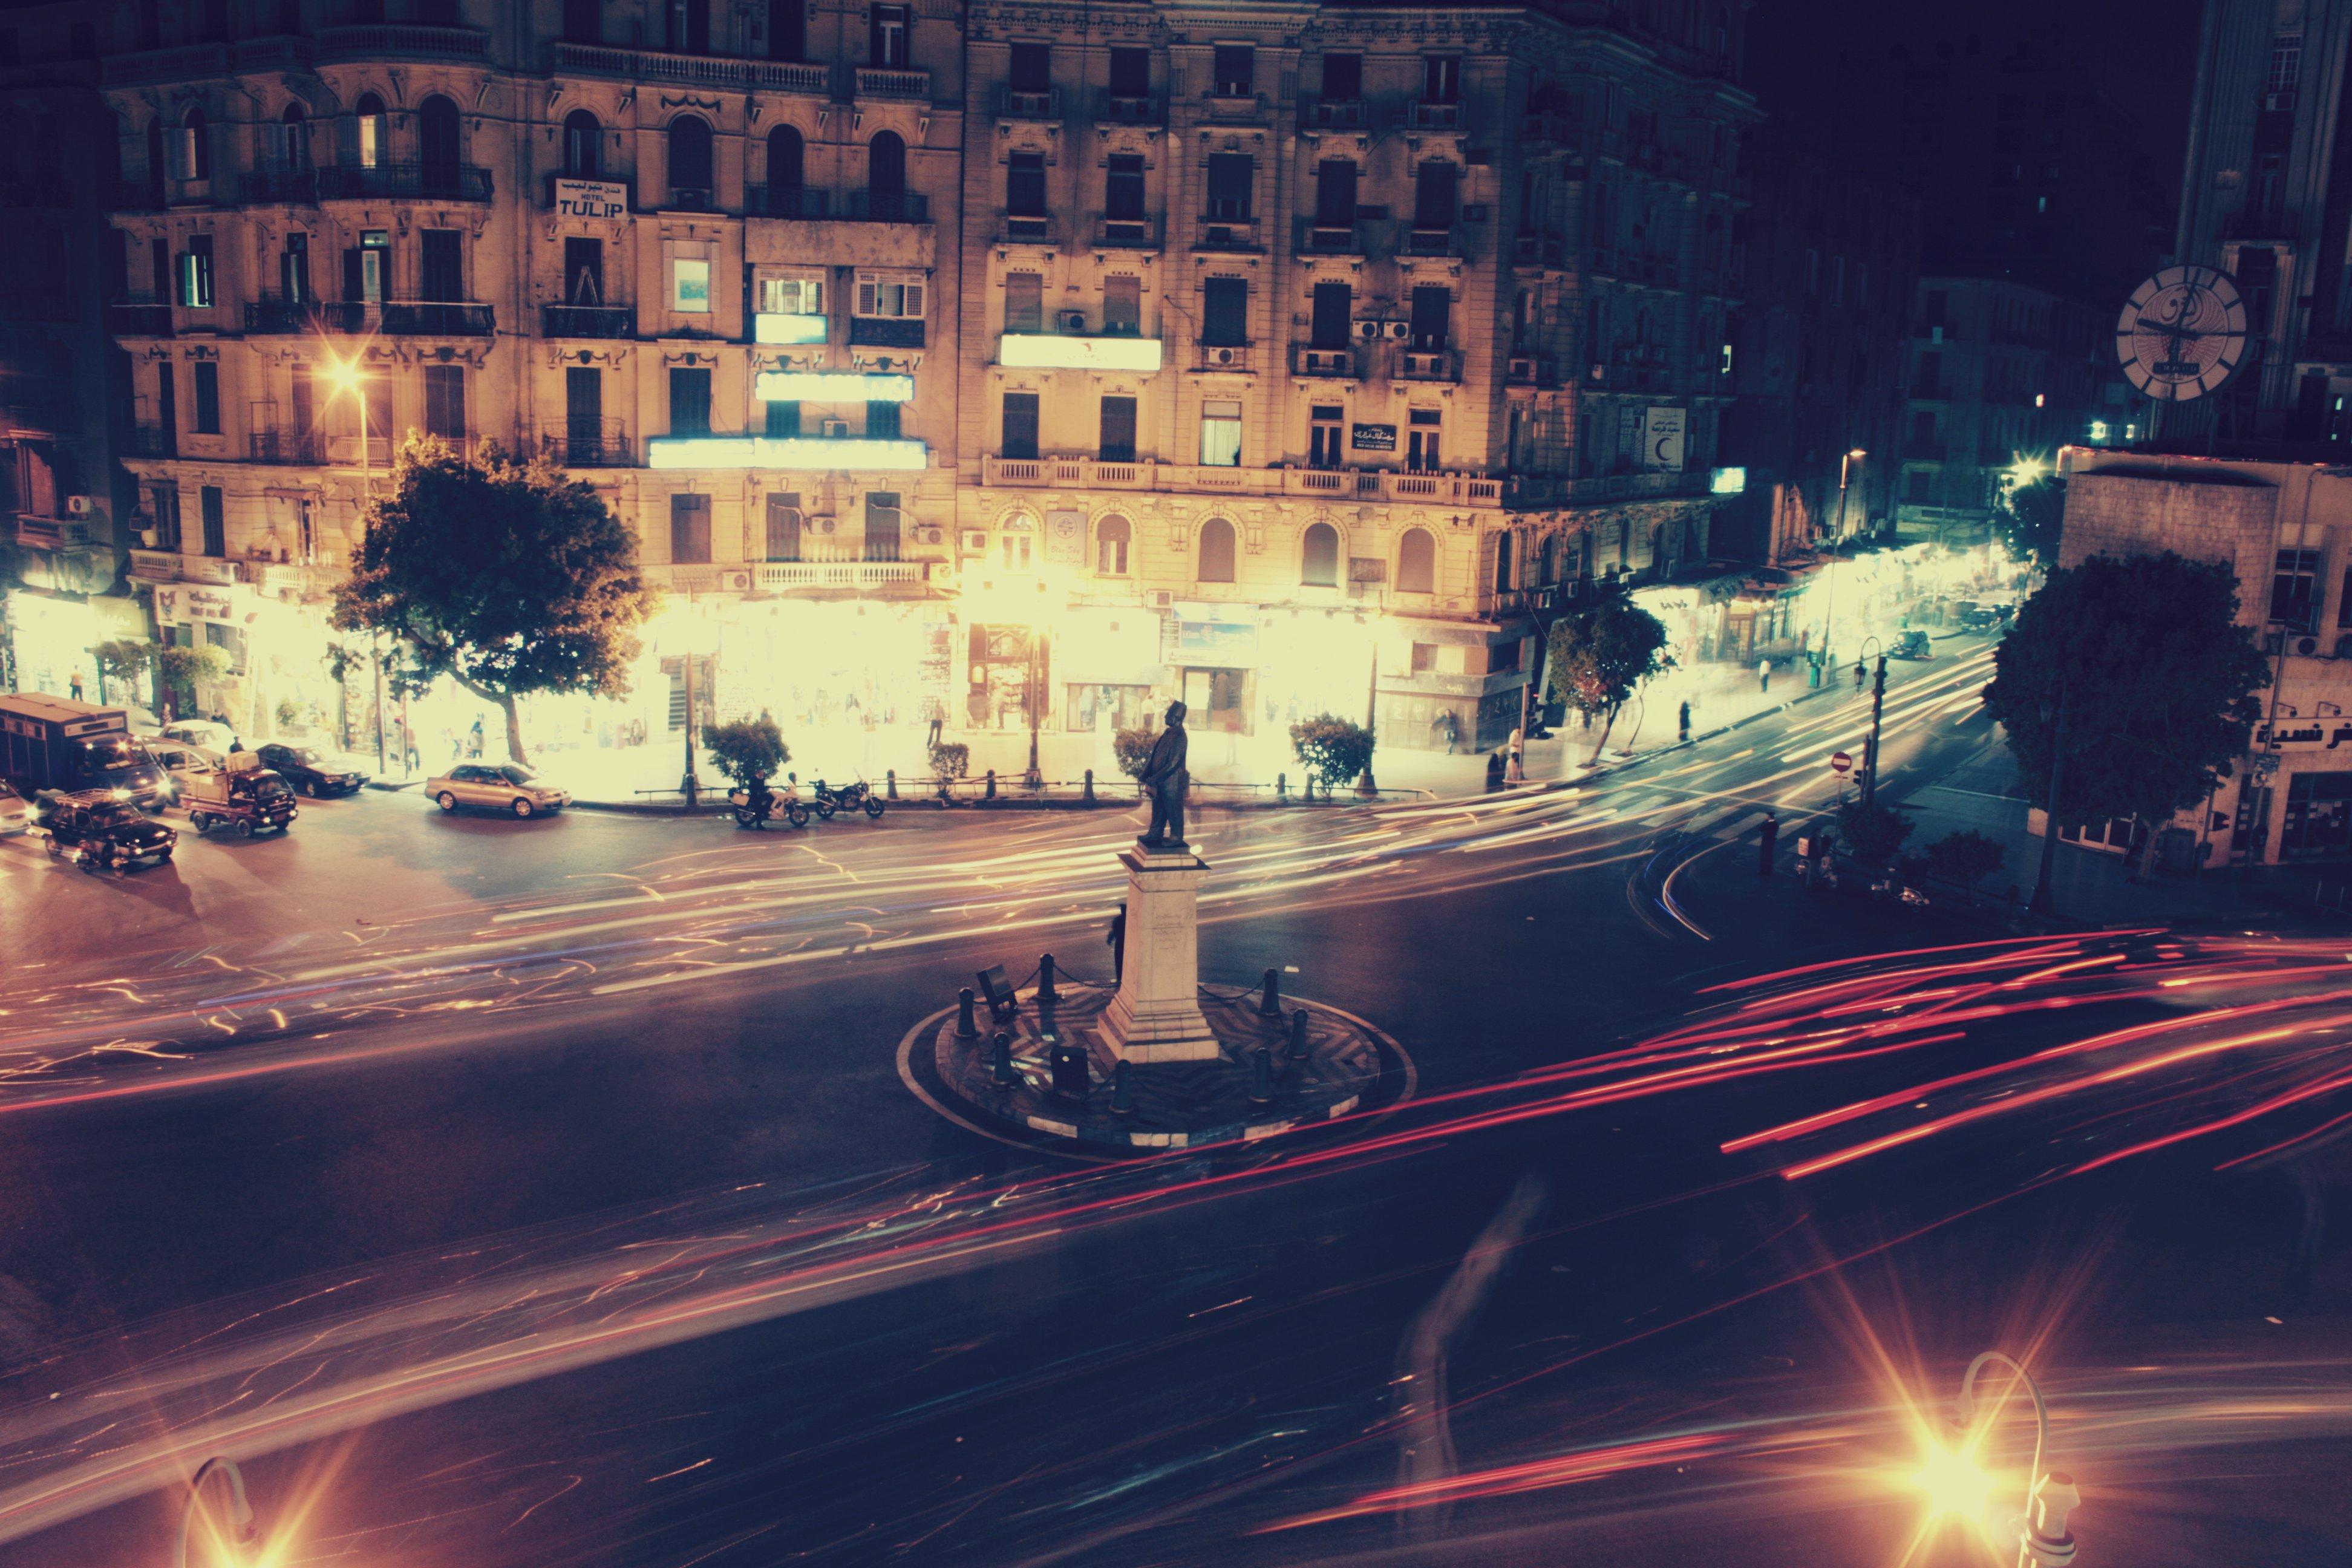 Cairo Roundabout